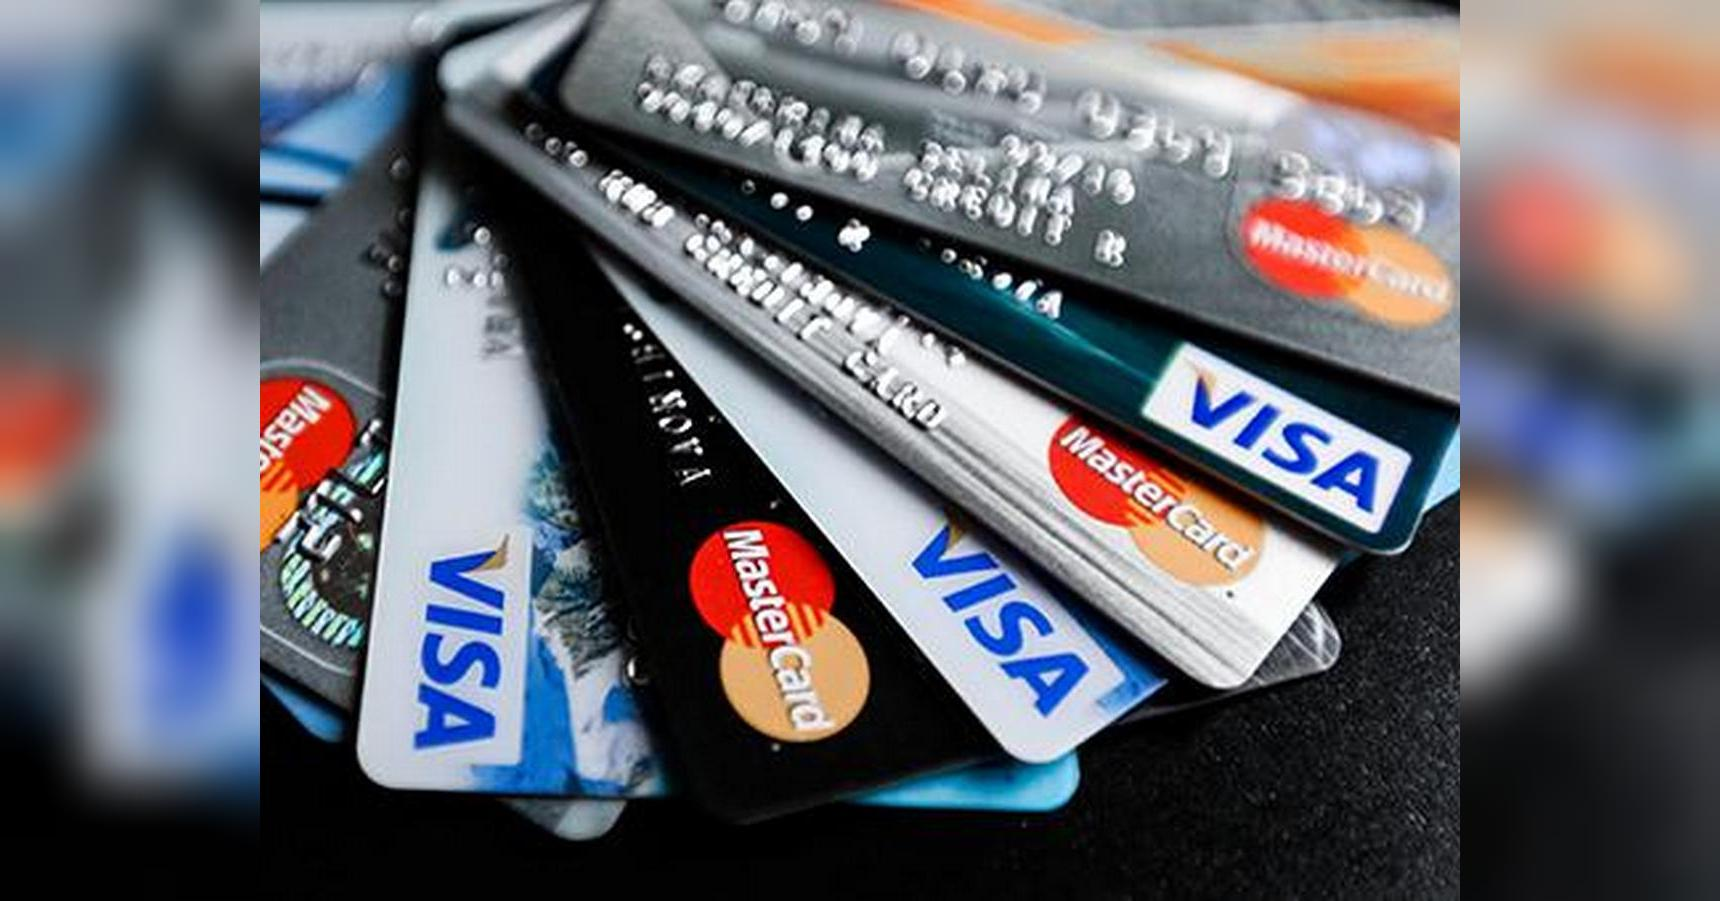 Картинки банковских карточек, про